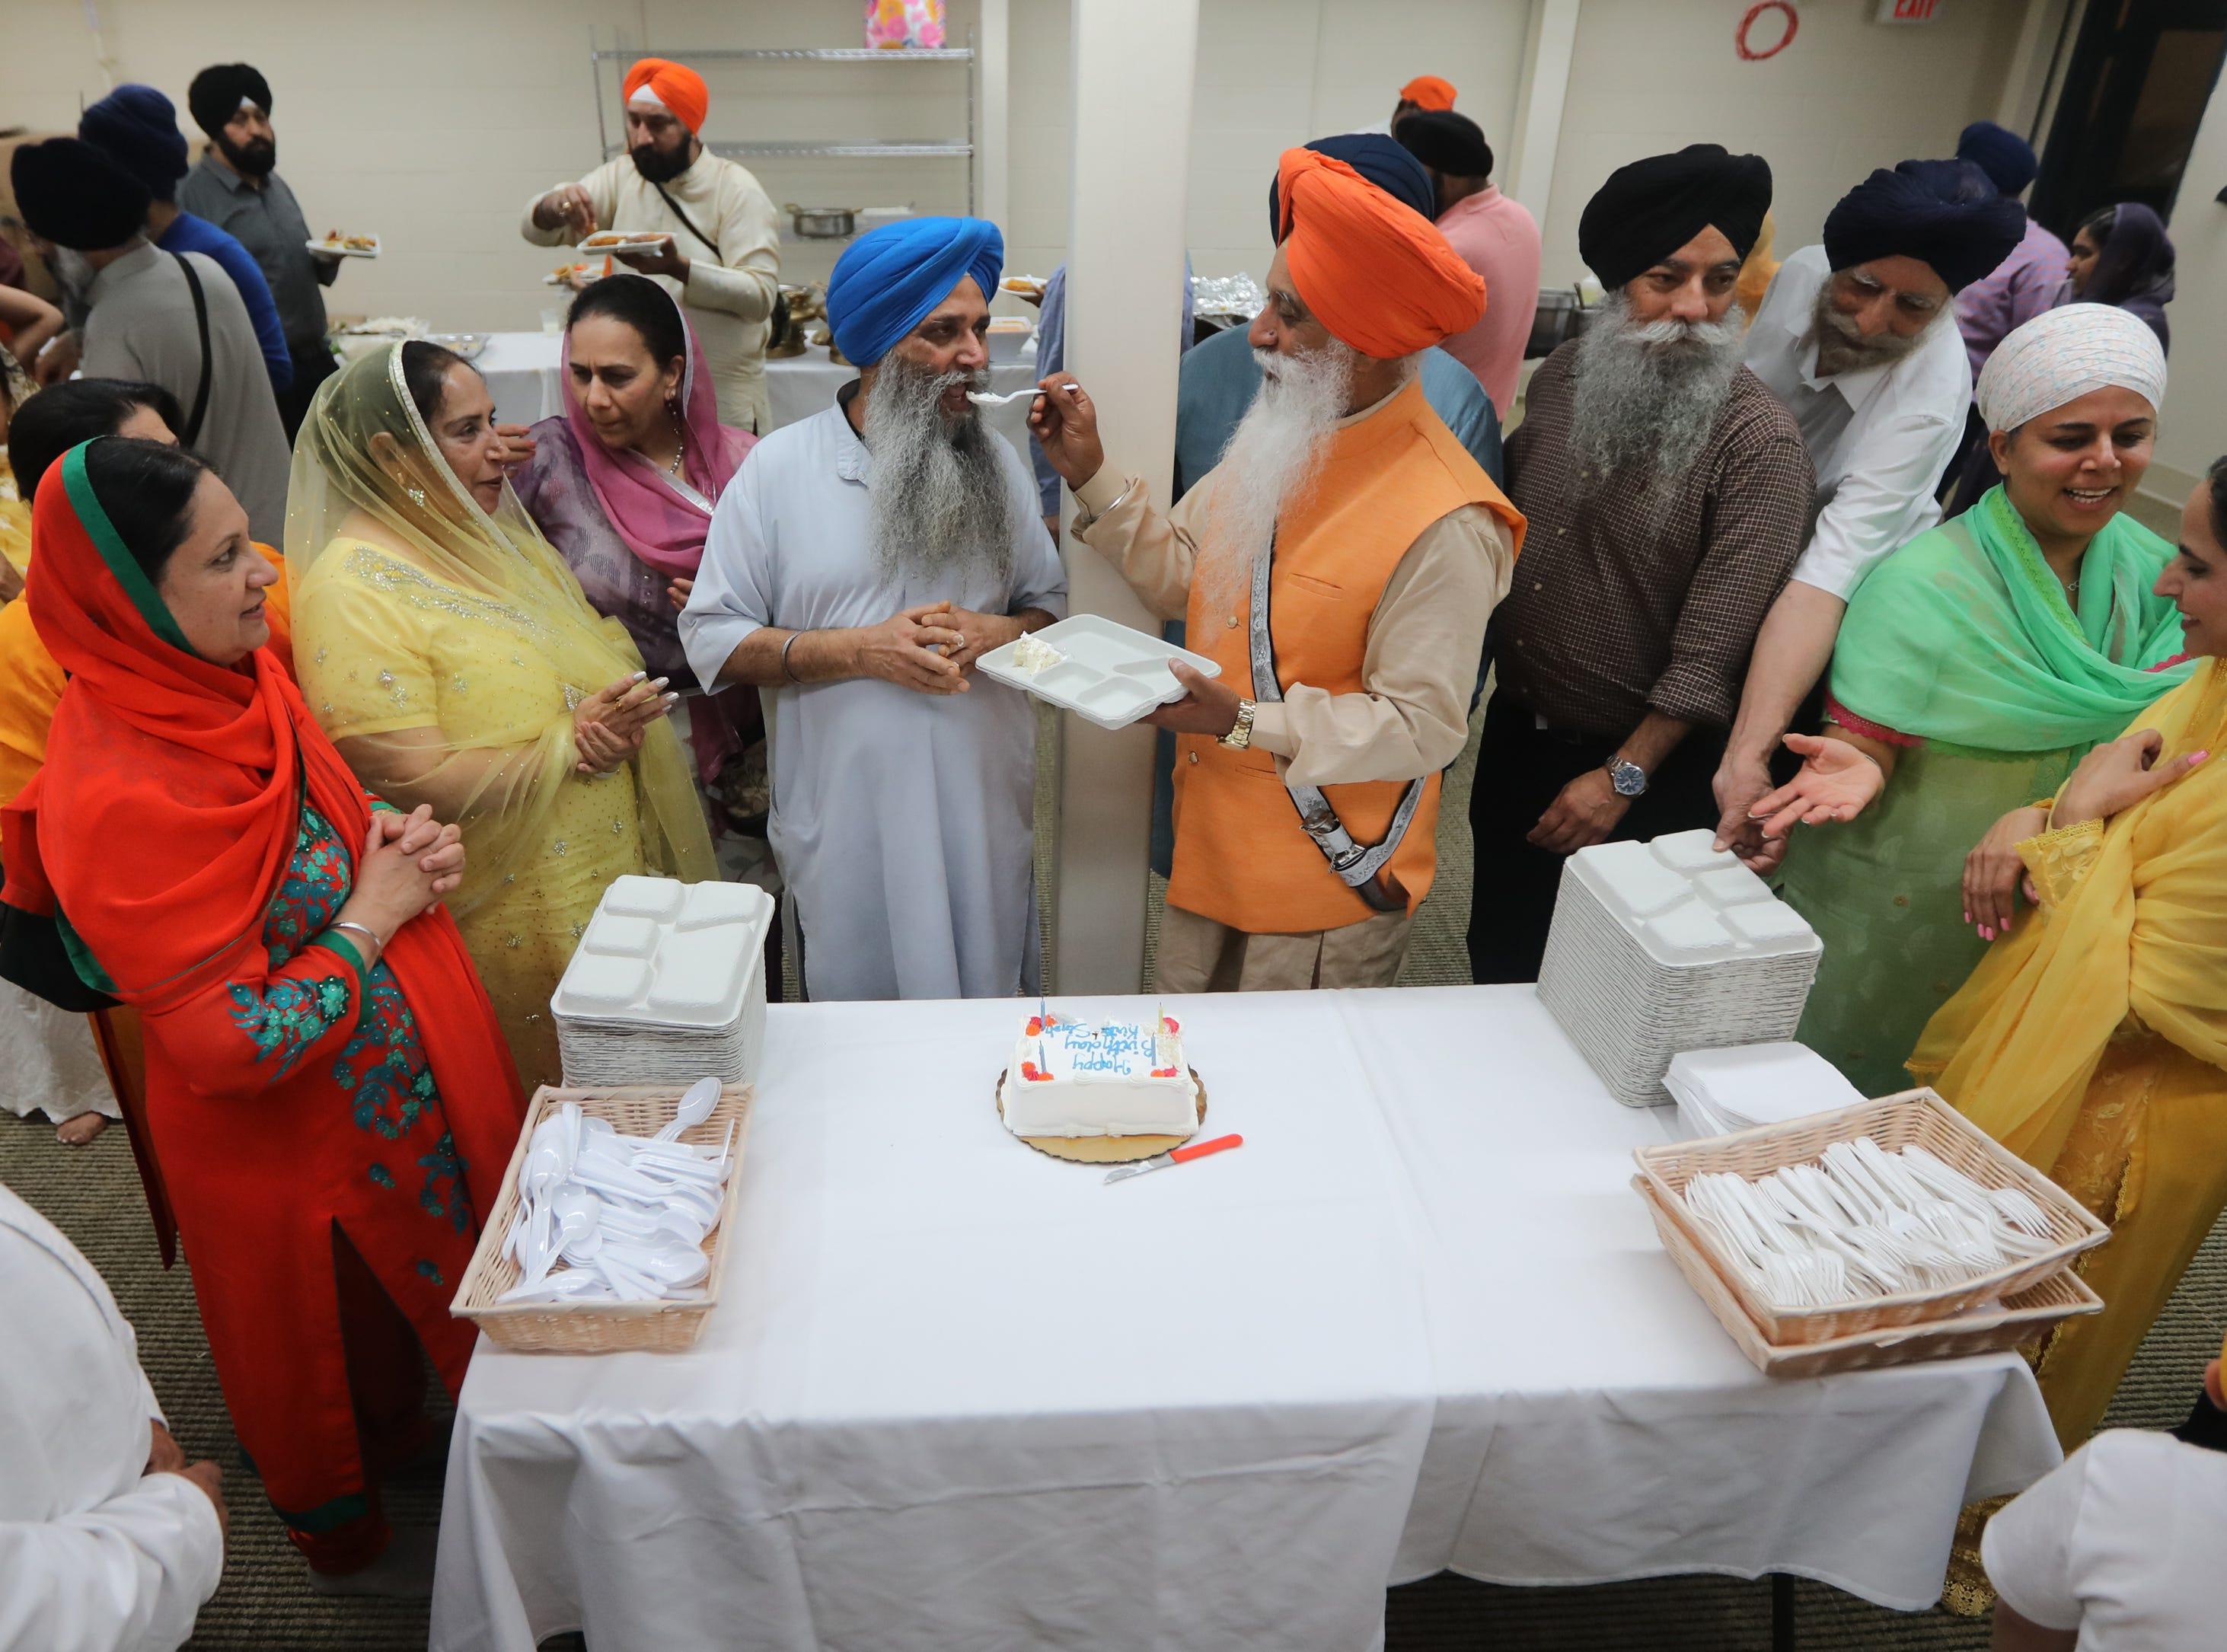 People, including, Chairman of the Board, Amrik Singh Sikland  (orange turban), line up to feed, Priest Kirtan Singh (blue turban) his birthday cake.  Sunday, April, 14, 2019